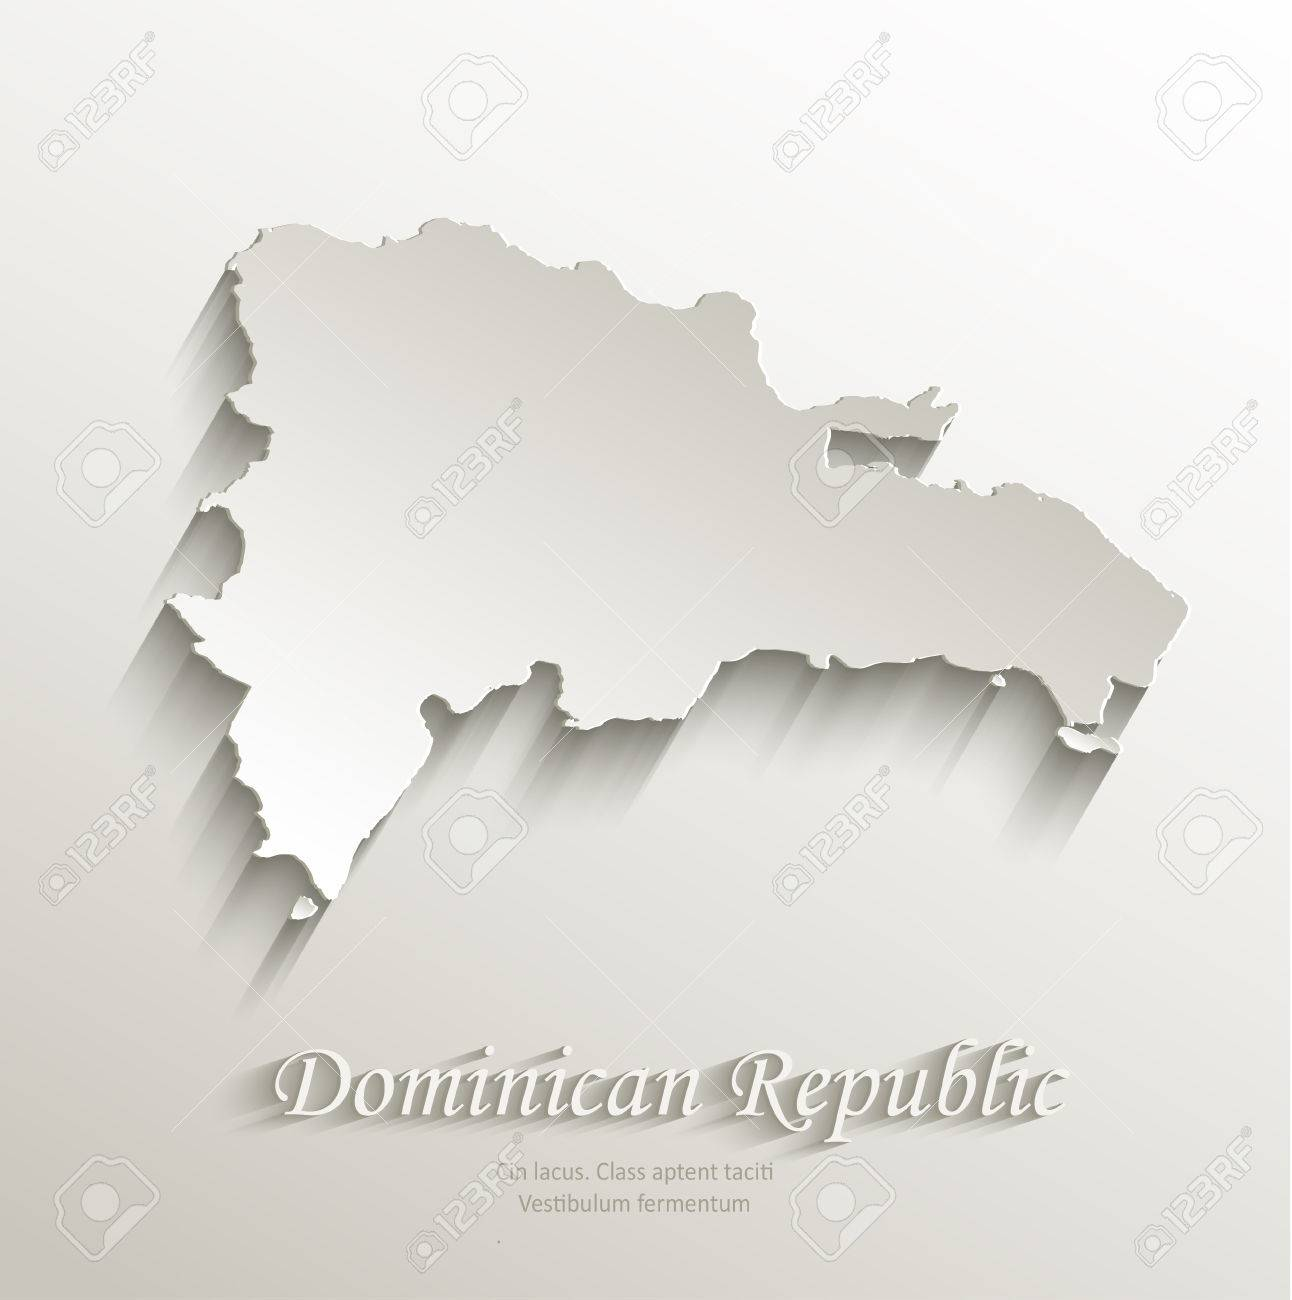 Dominican Republic Map Card Paper D Natural Vector Royalty Free - Dominican republic map vector